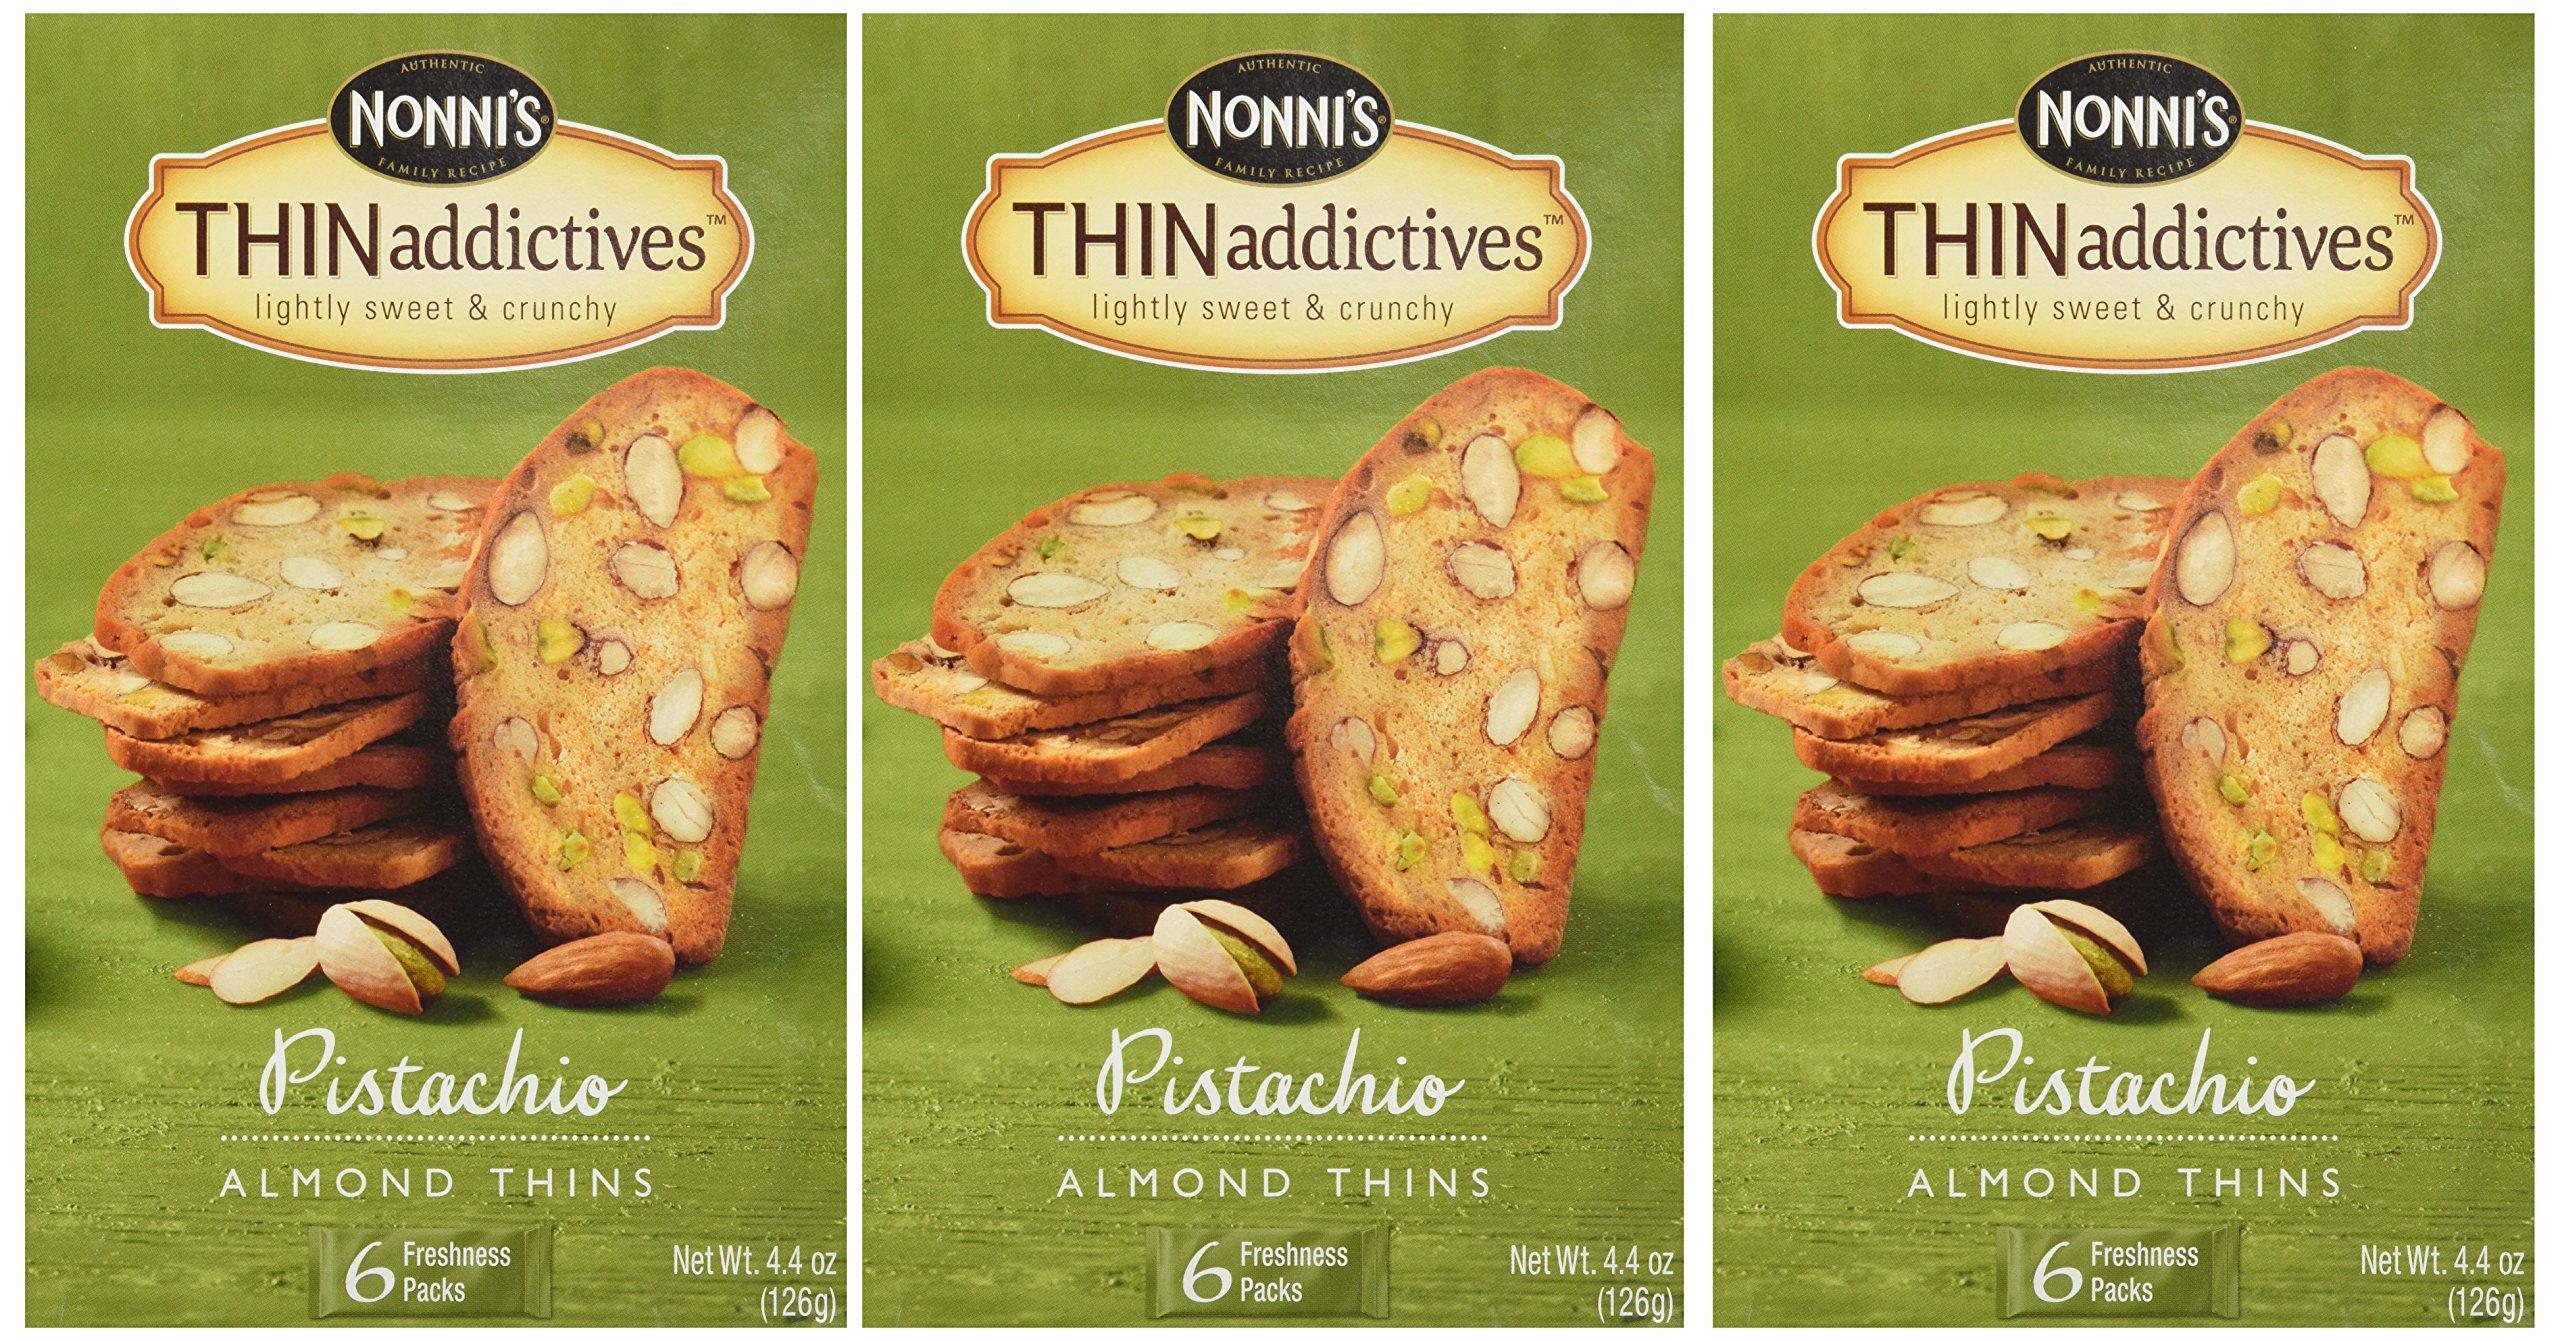 Nonni's Thin Addictives Pistachio Almond Thins 4.5 oz (3 Pack)